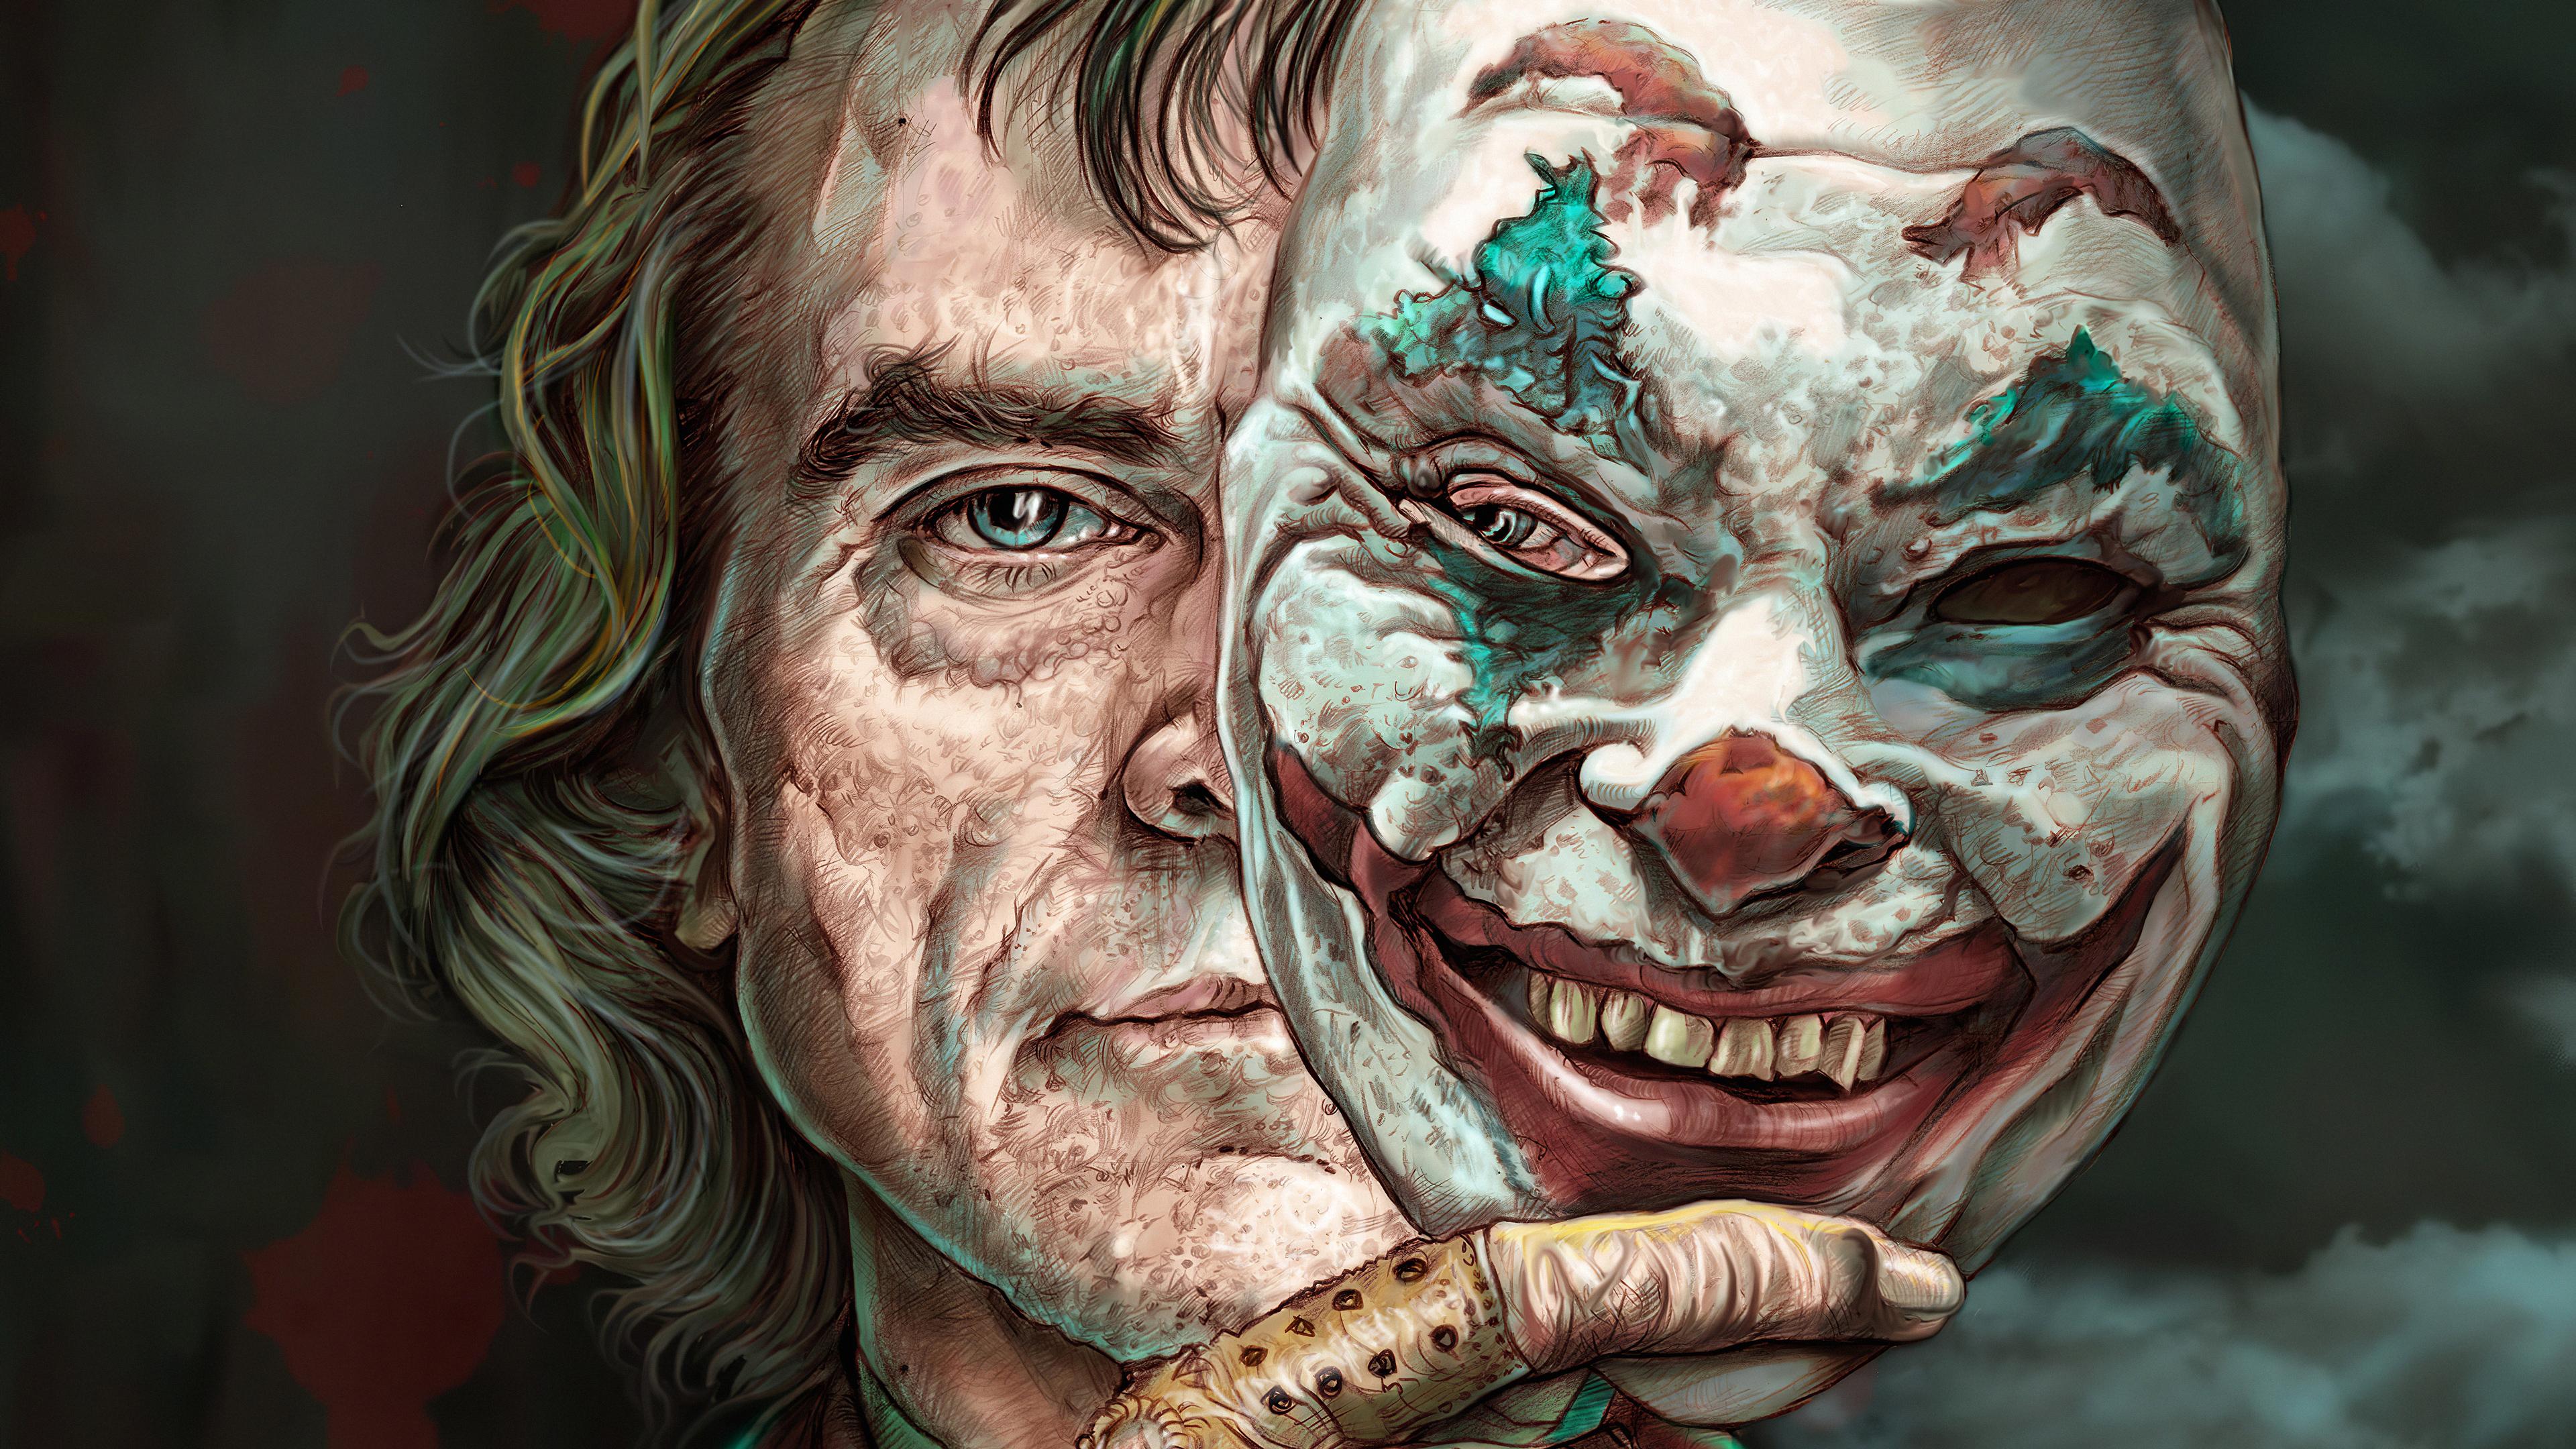 Joker Two Face 4k, HD Superheroes, 4k Wallpapers, Images ...